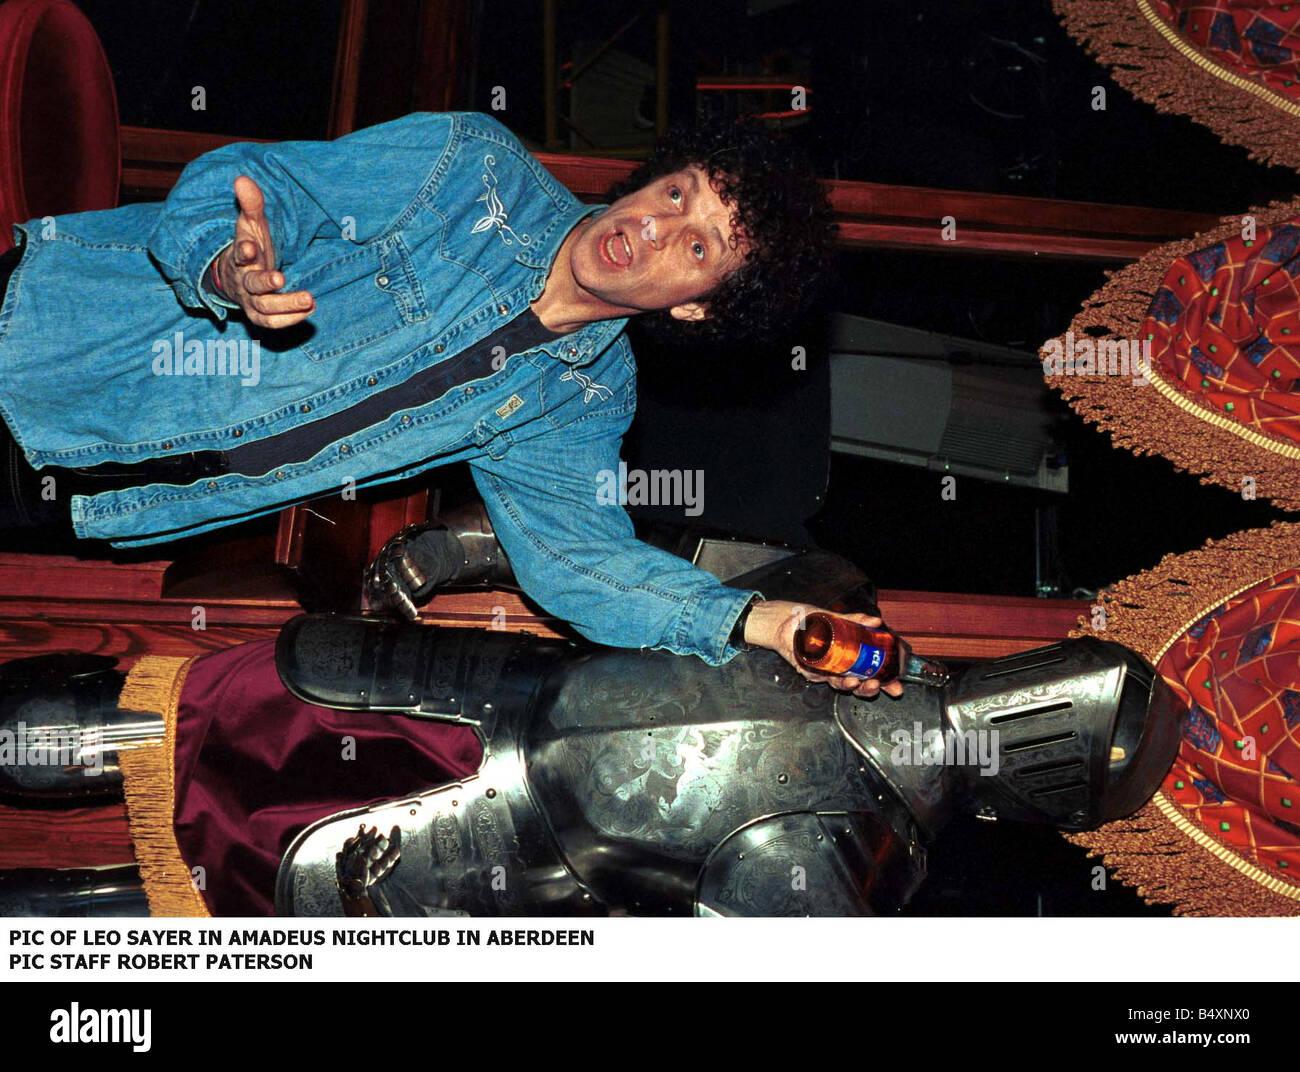 Amadeus Nightclub Aberdeen leo sayer february 1999 holding bottle of beer in amadeus